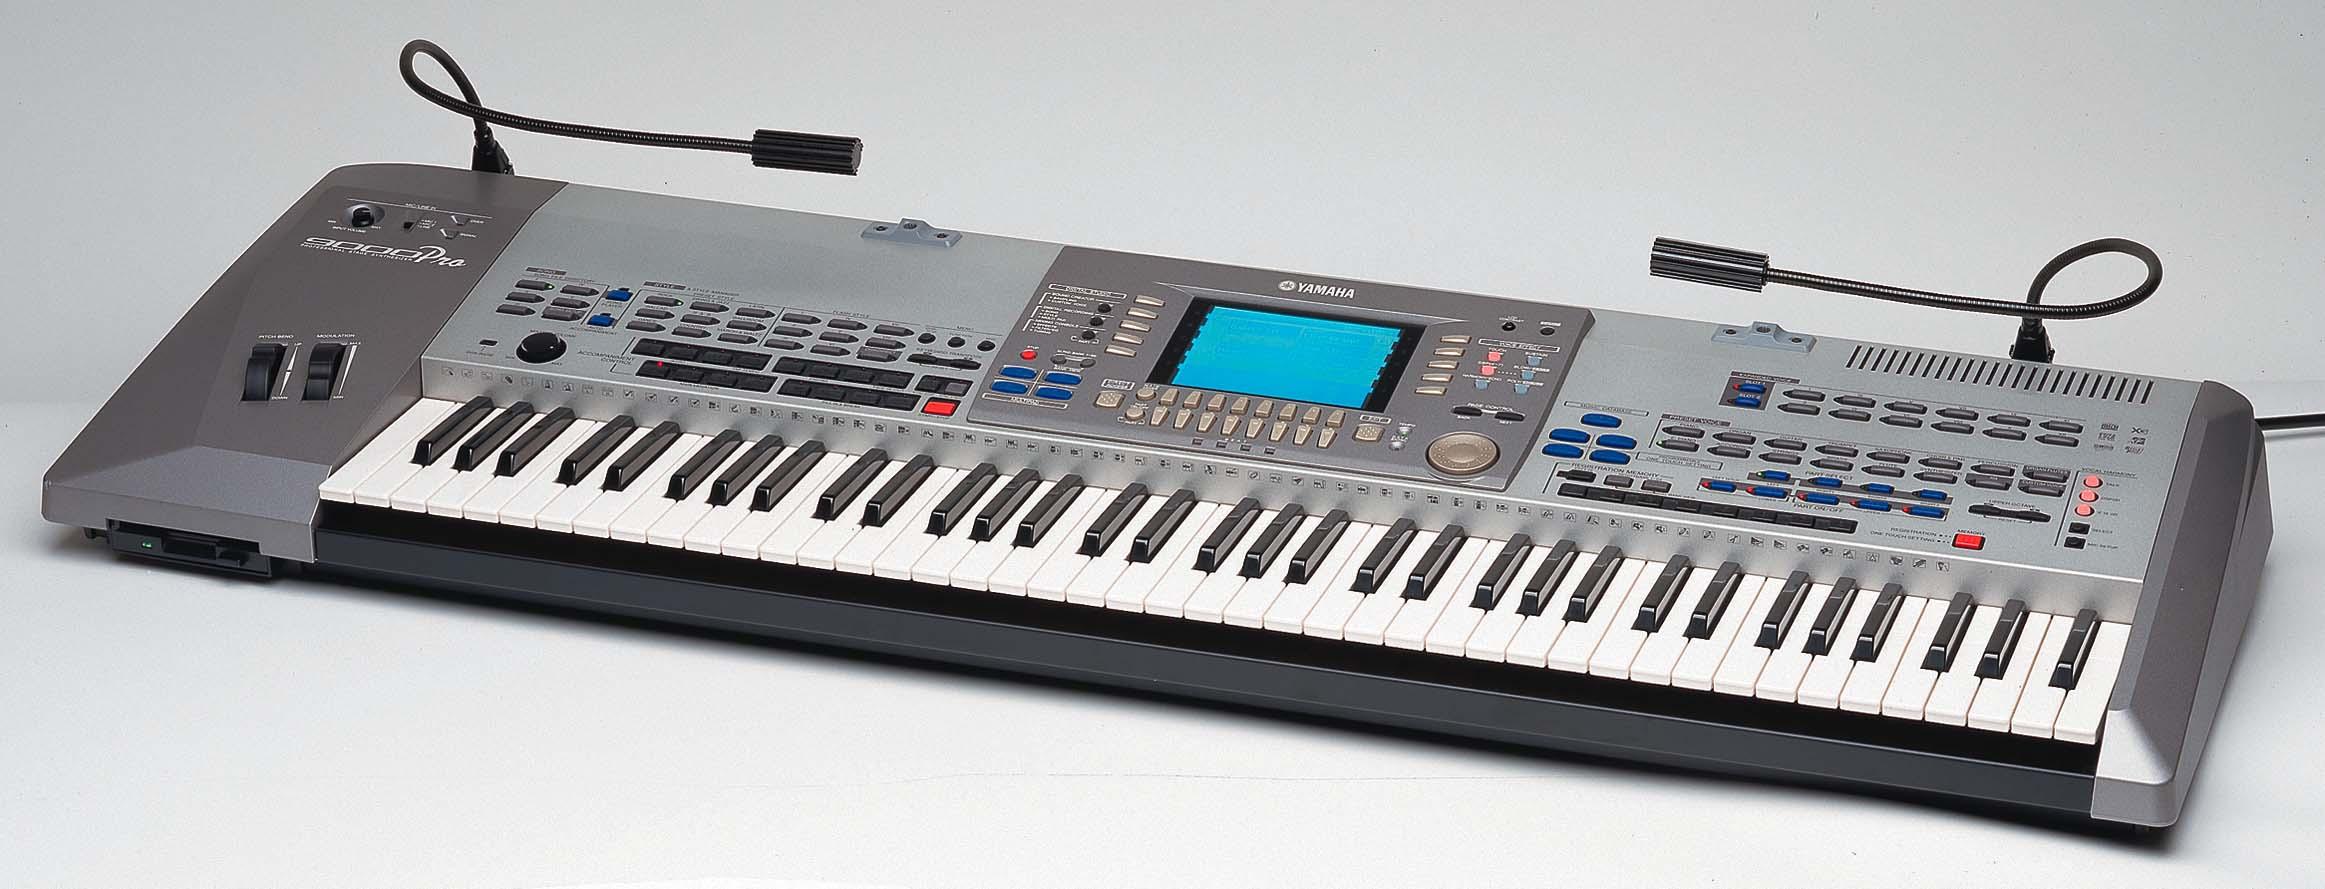 Yamaha psr 9000 keyboard price in india 64gb, roland f20